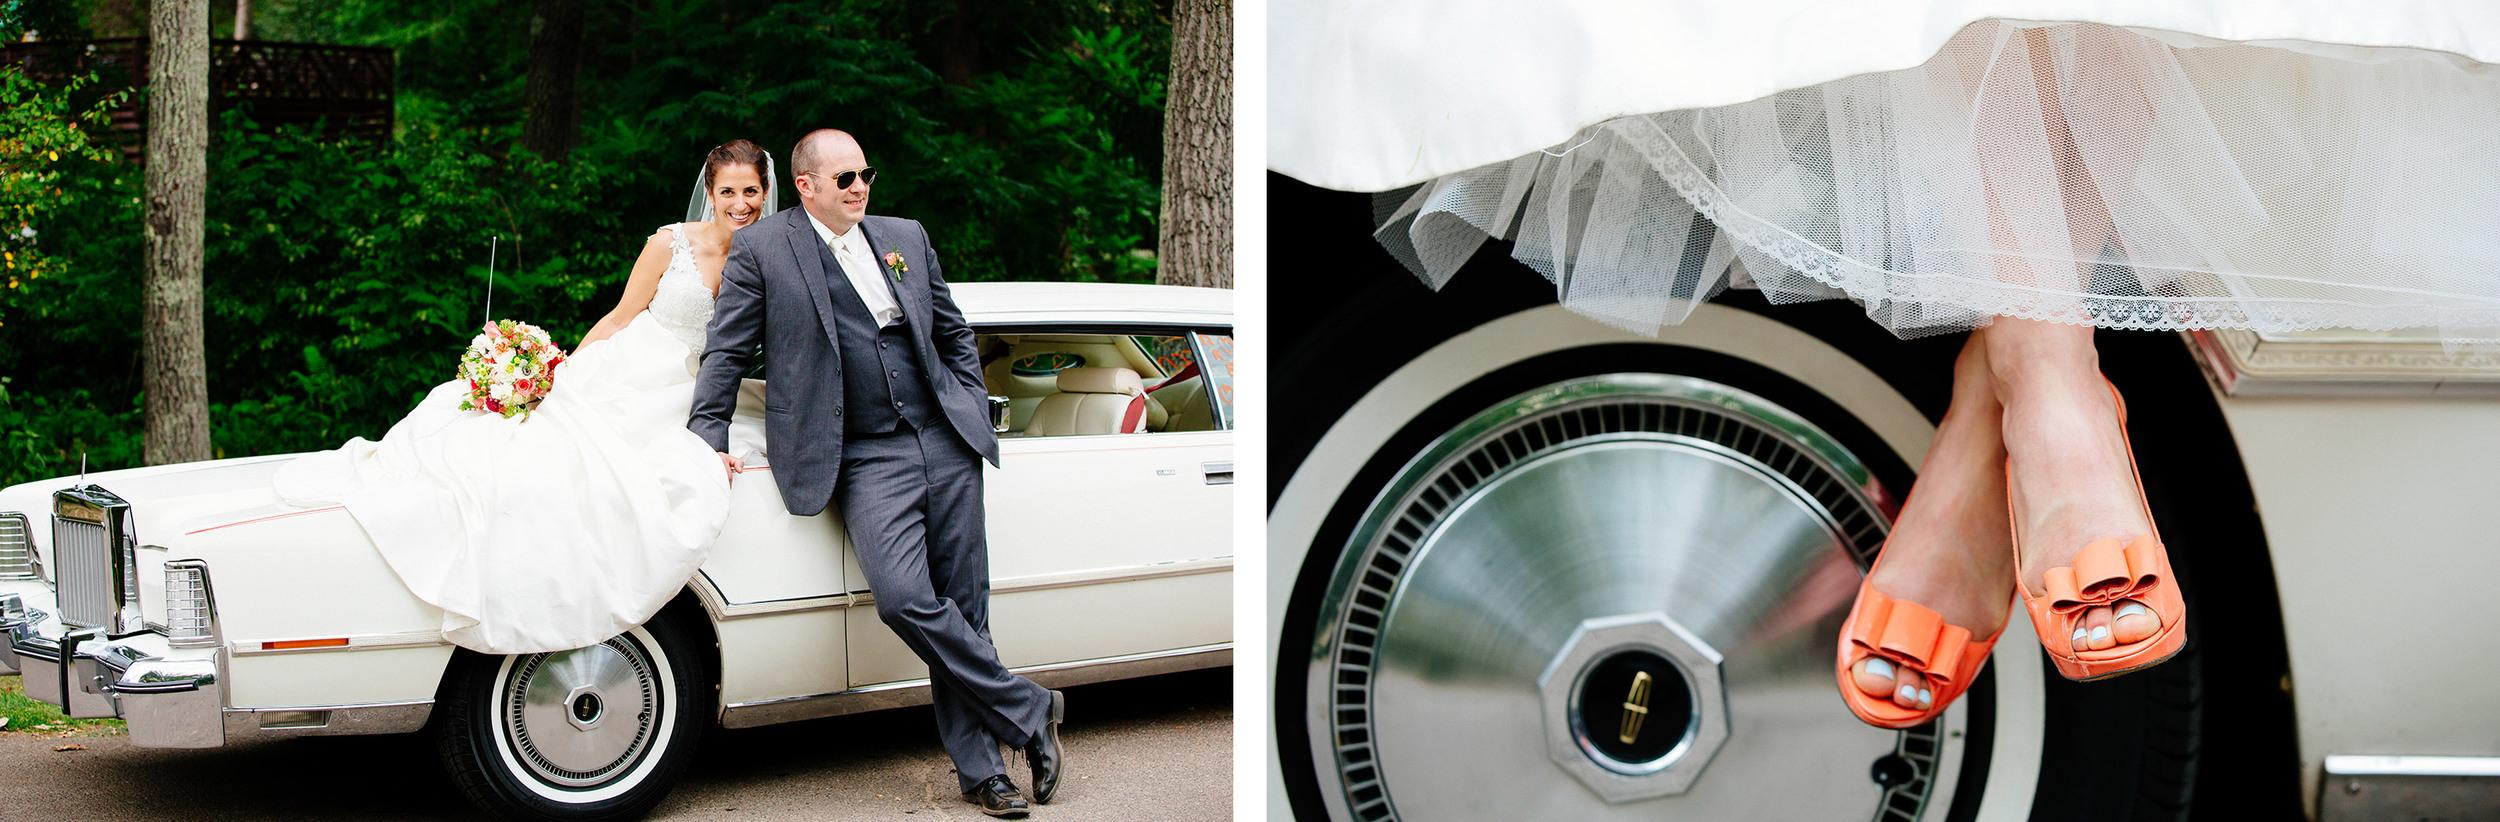 Grandview_Lodge_Wedding_18.jpg